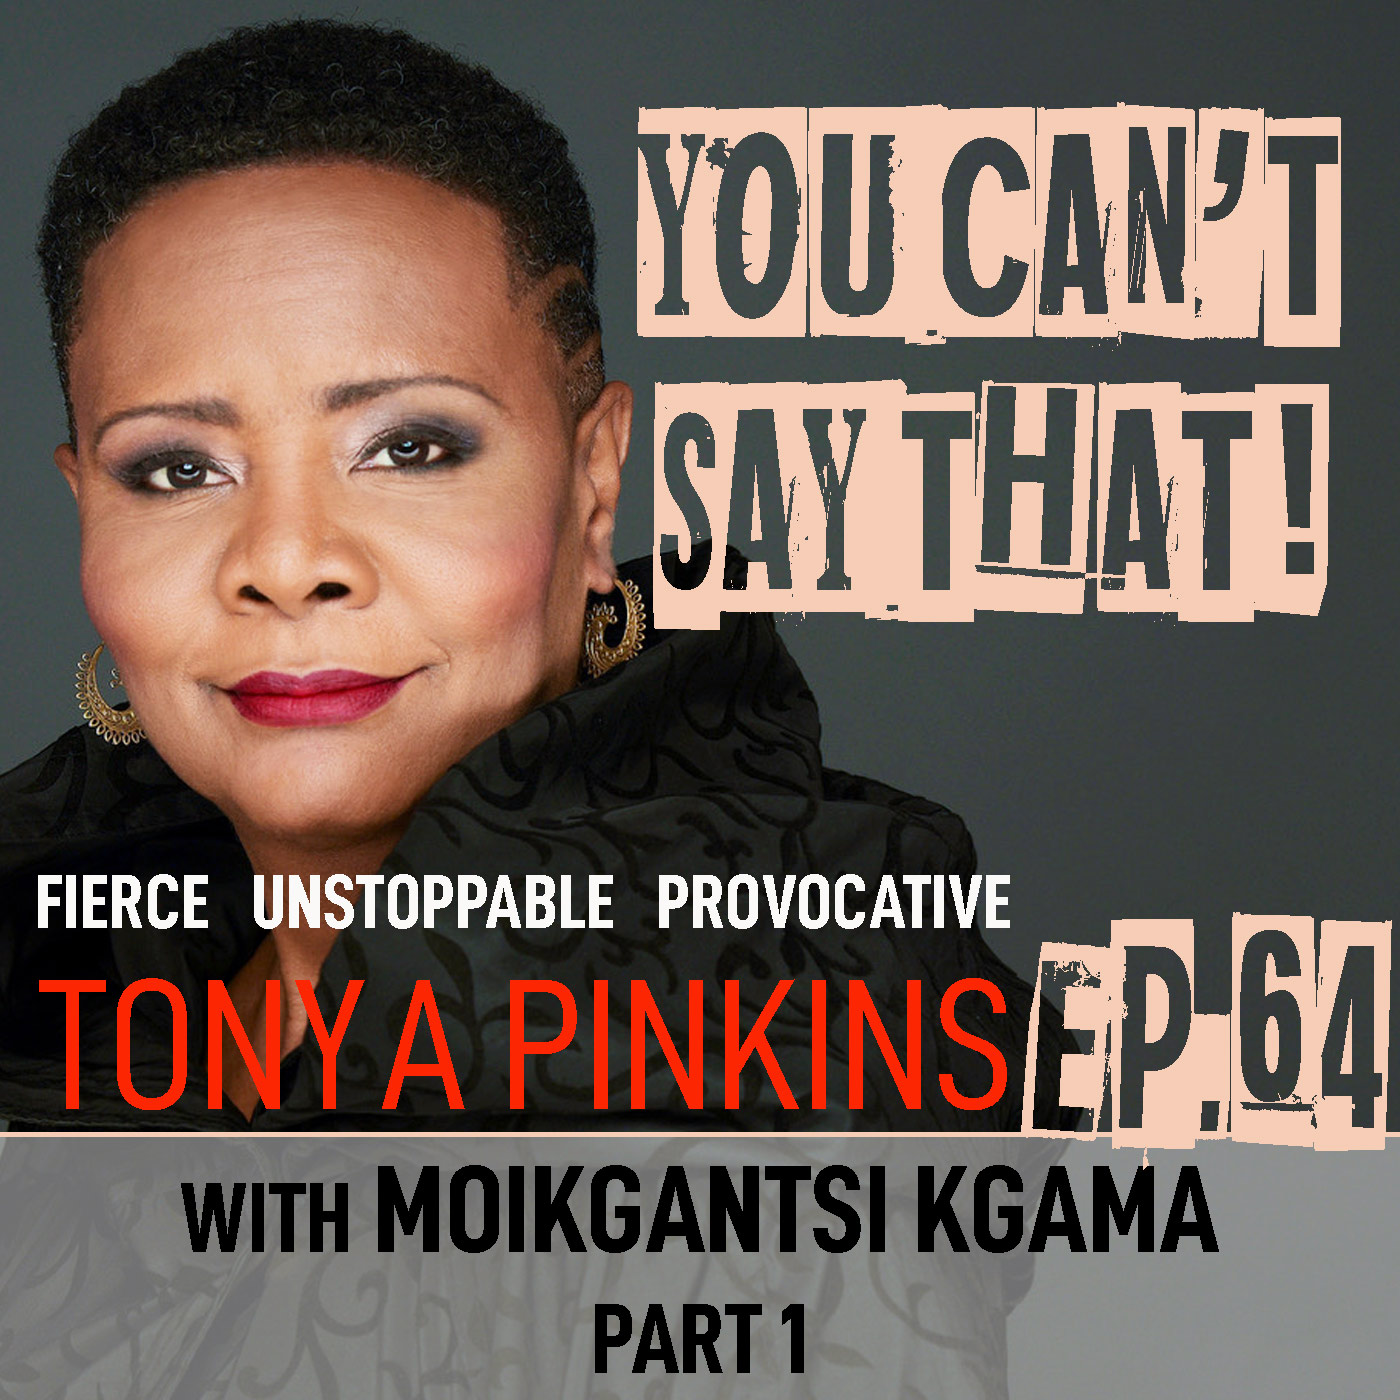 You Can't Say That Tonya Pinkins Ep64 - Moikgantsi Kgama (Part 1)